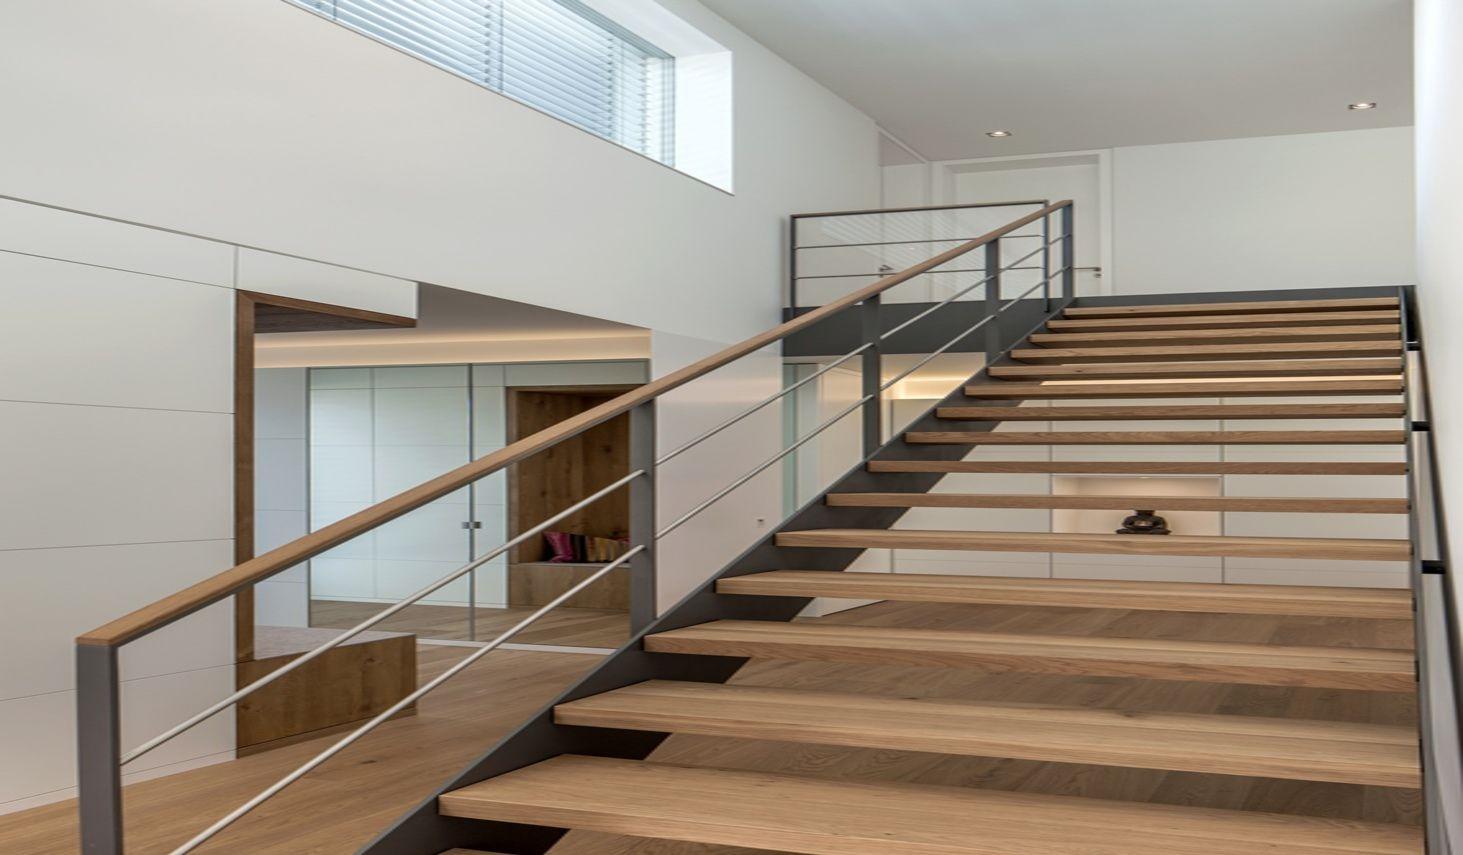 Neubau Wh D Mittelfranken 2015 Progettazione Scale Scale Scale Interne